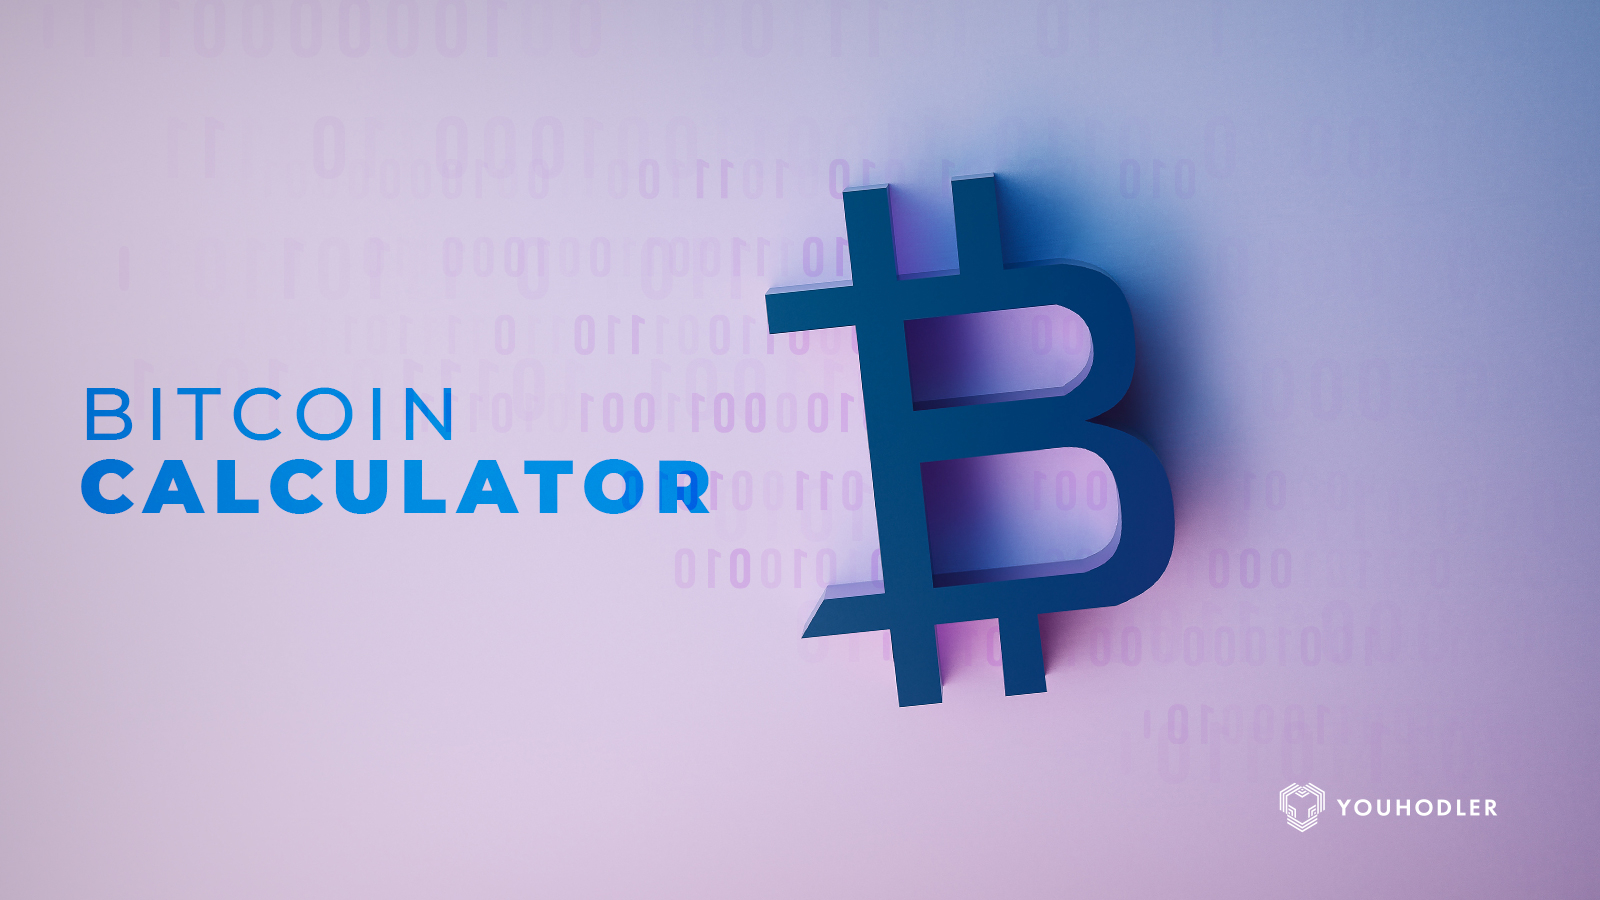 The bitcoin calculator logo